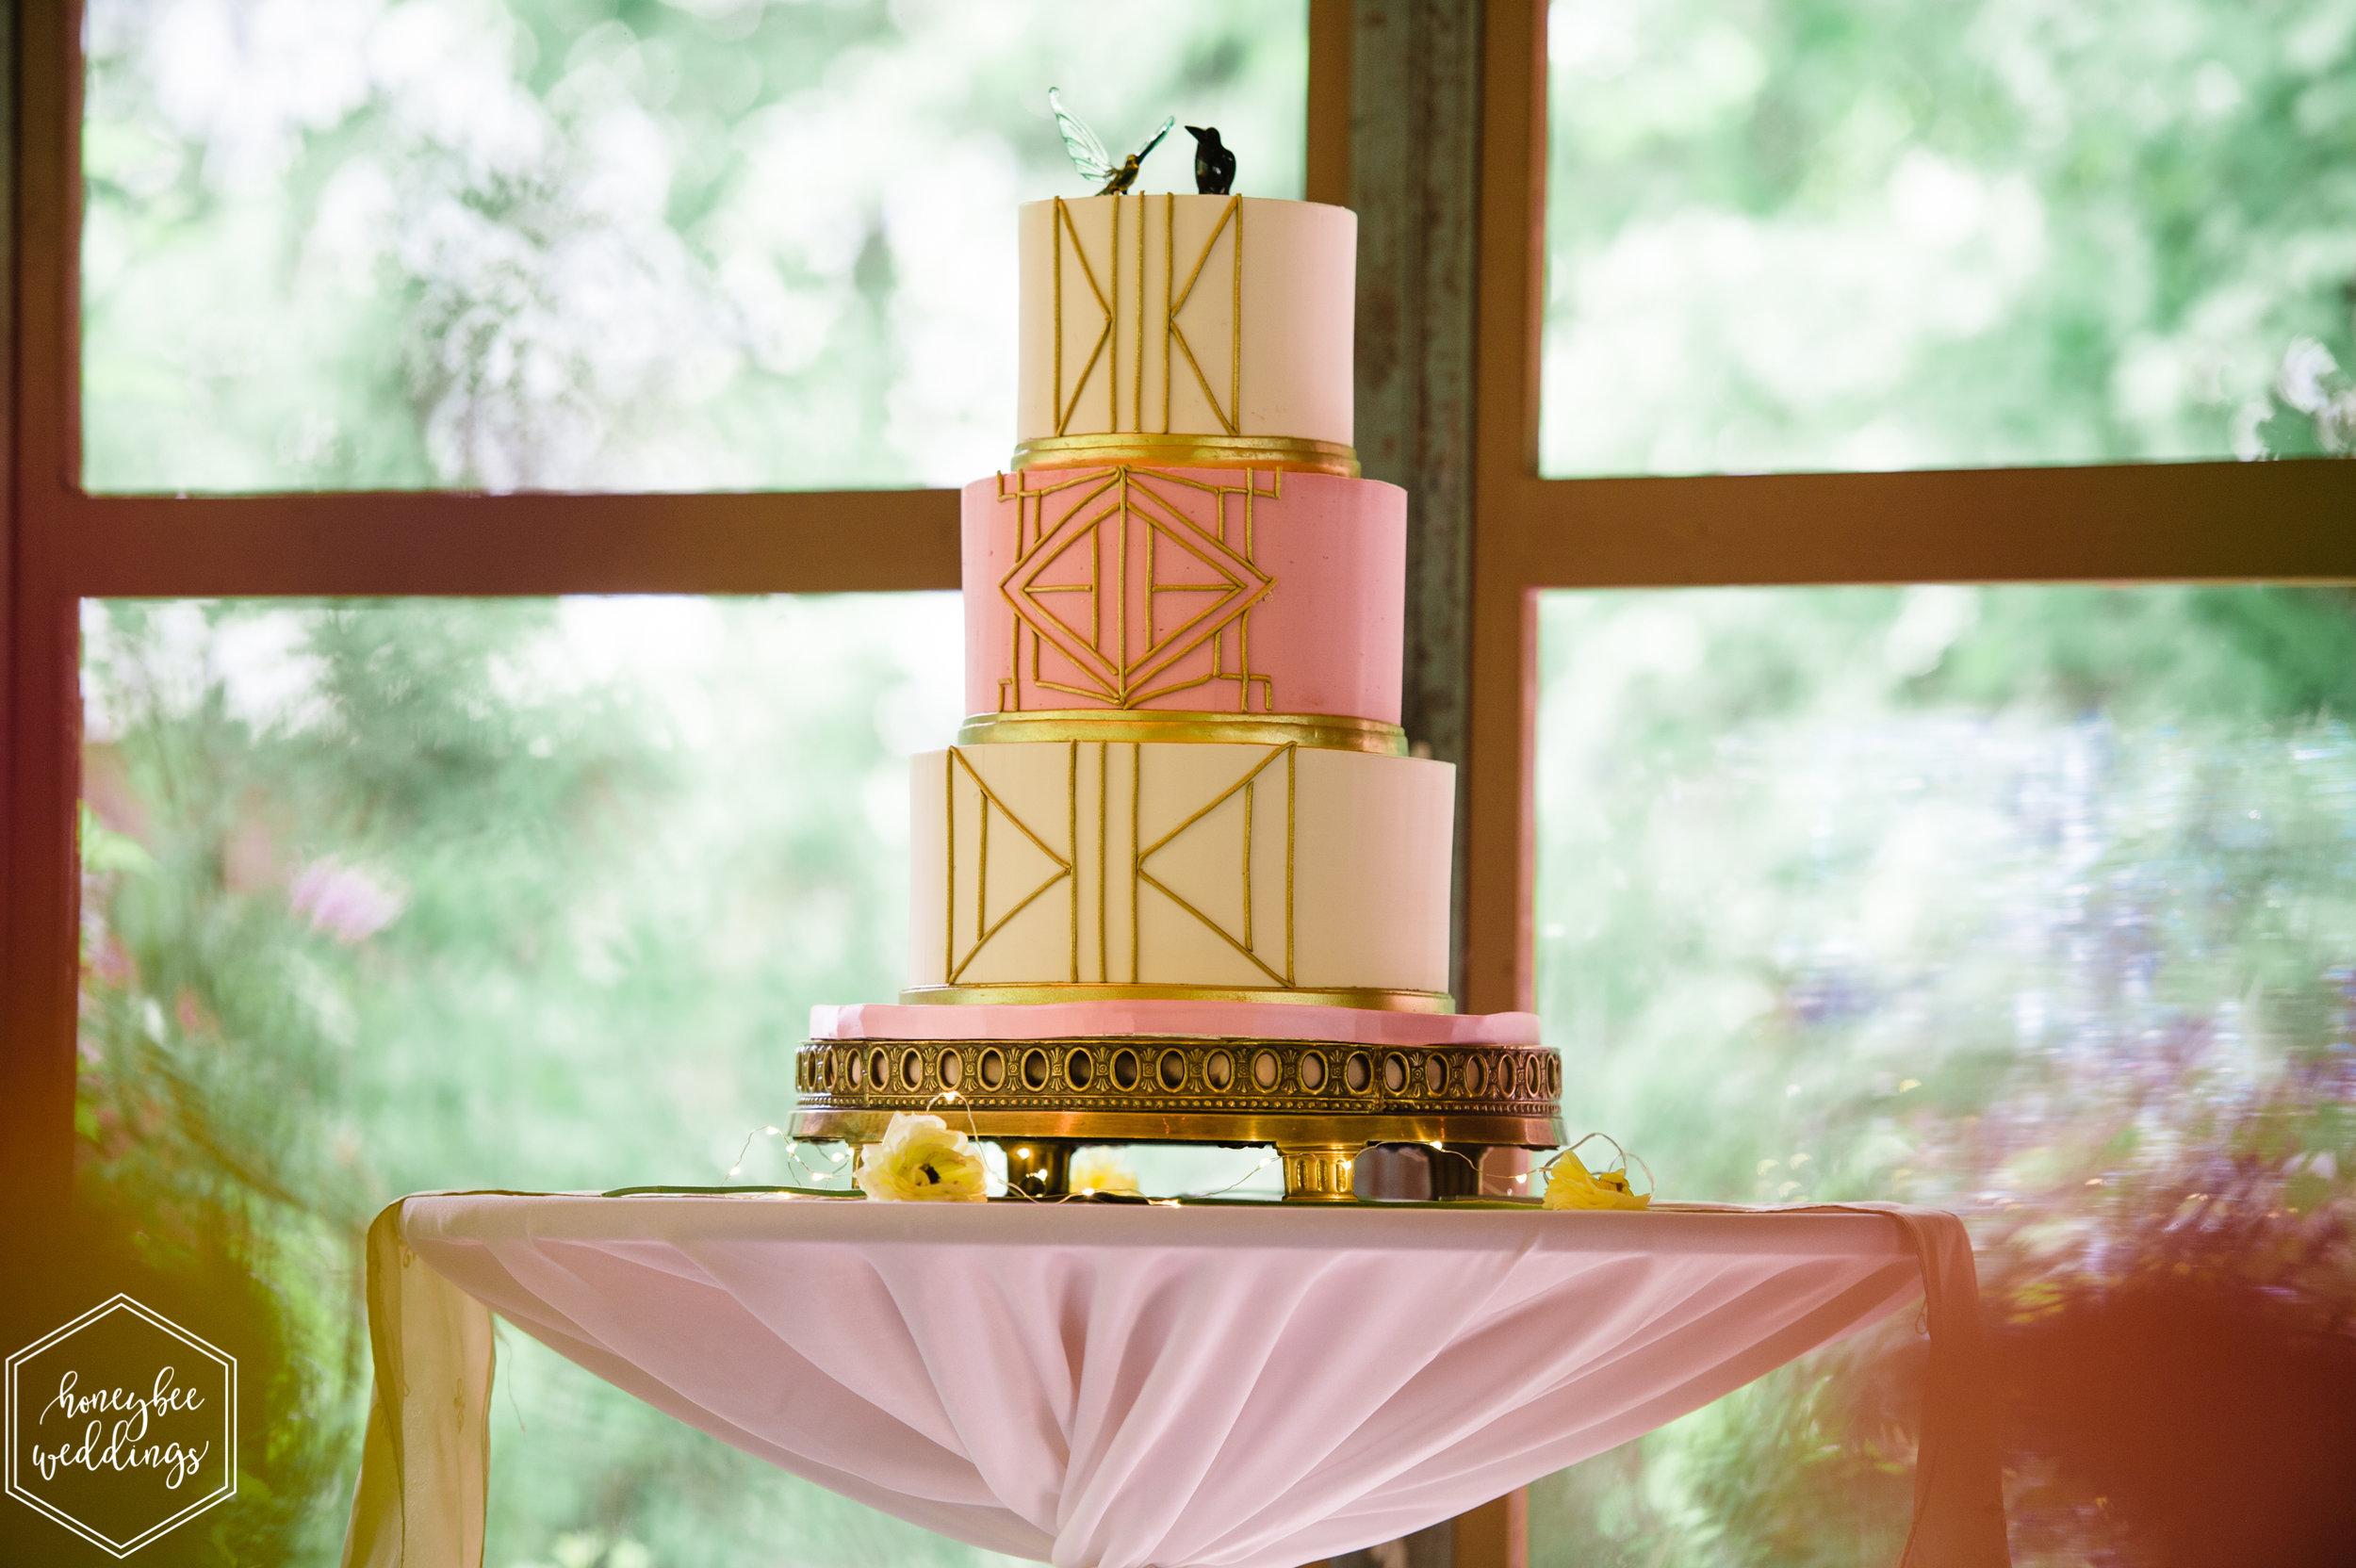 011Glacier National Park Wedding_Izaak Walton Inn Wedding_Honeybee Weddings_Norah & Kyle_June 08, 2019-1084.jpg